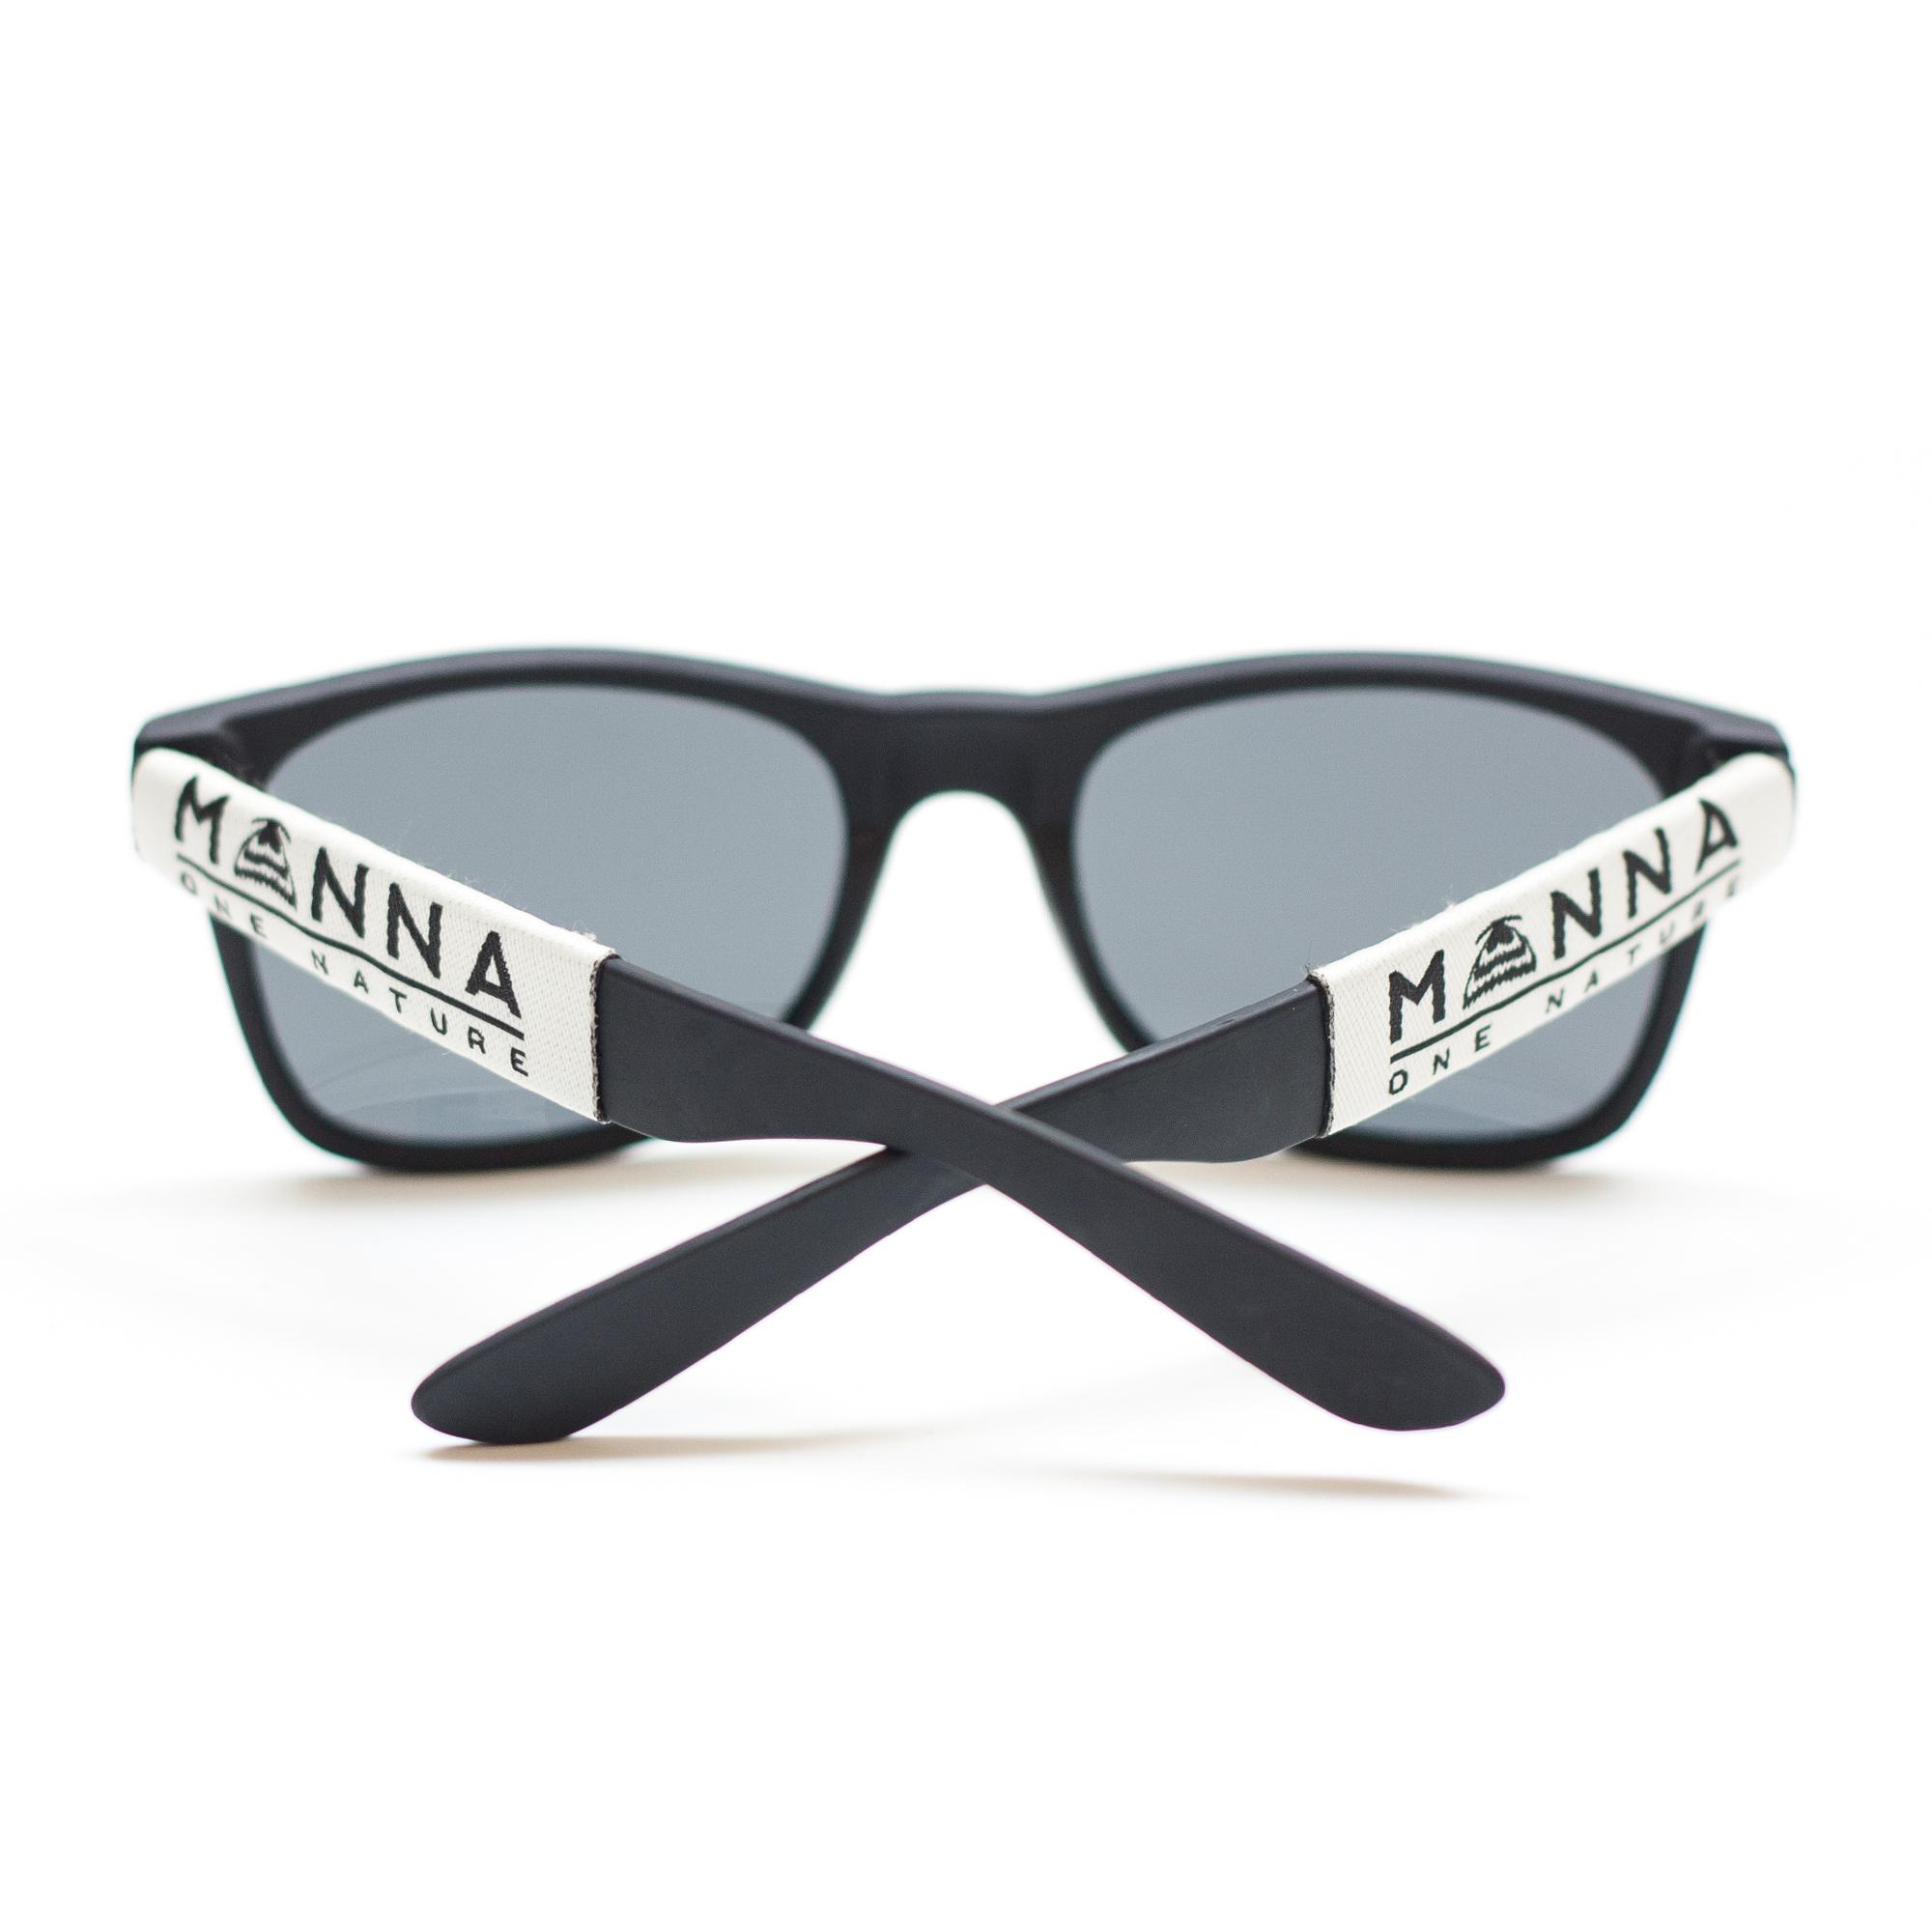 One Nature Sunglasses - 4